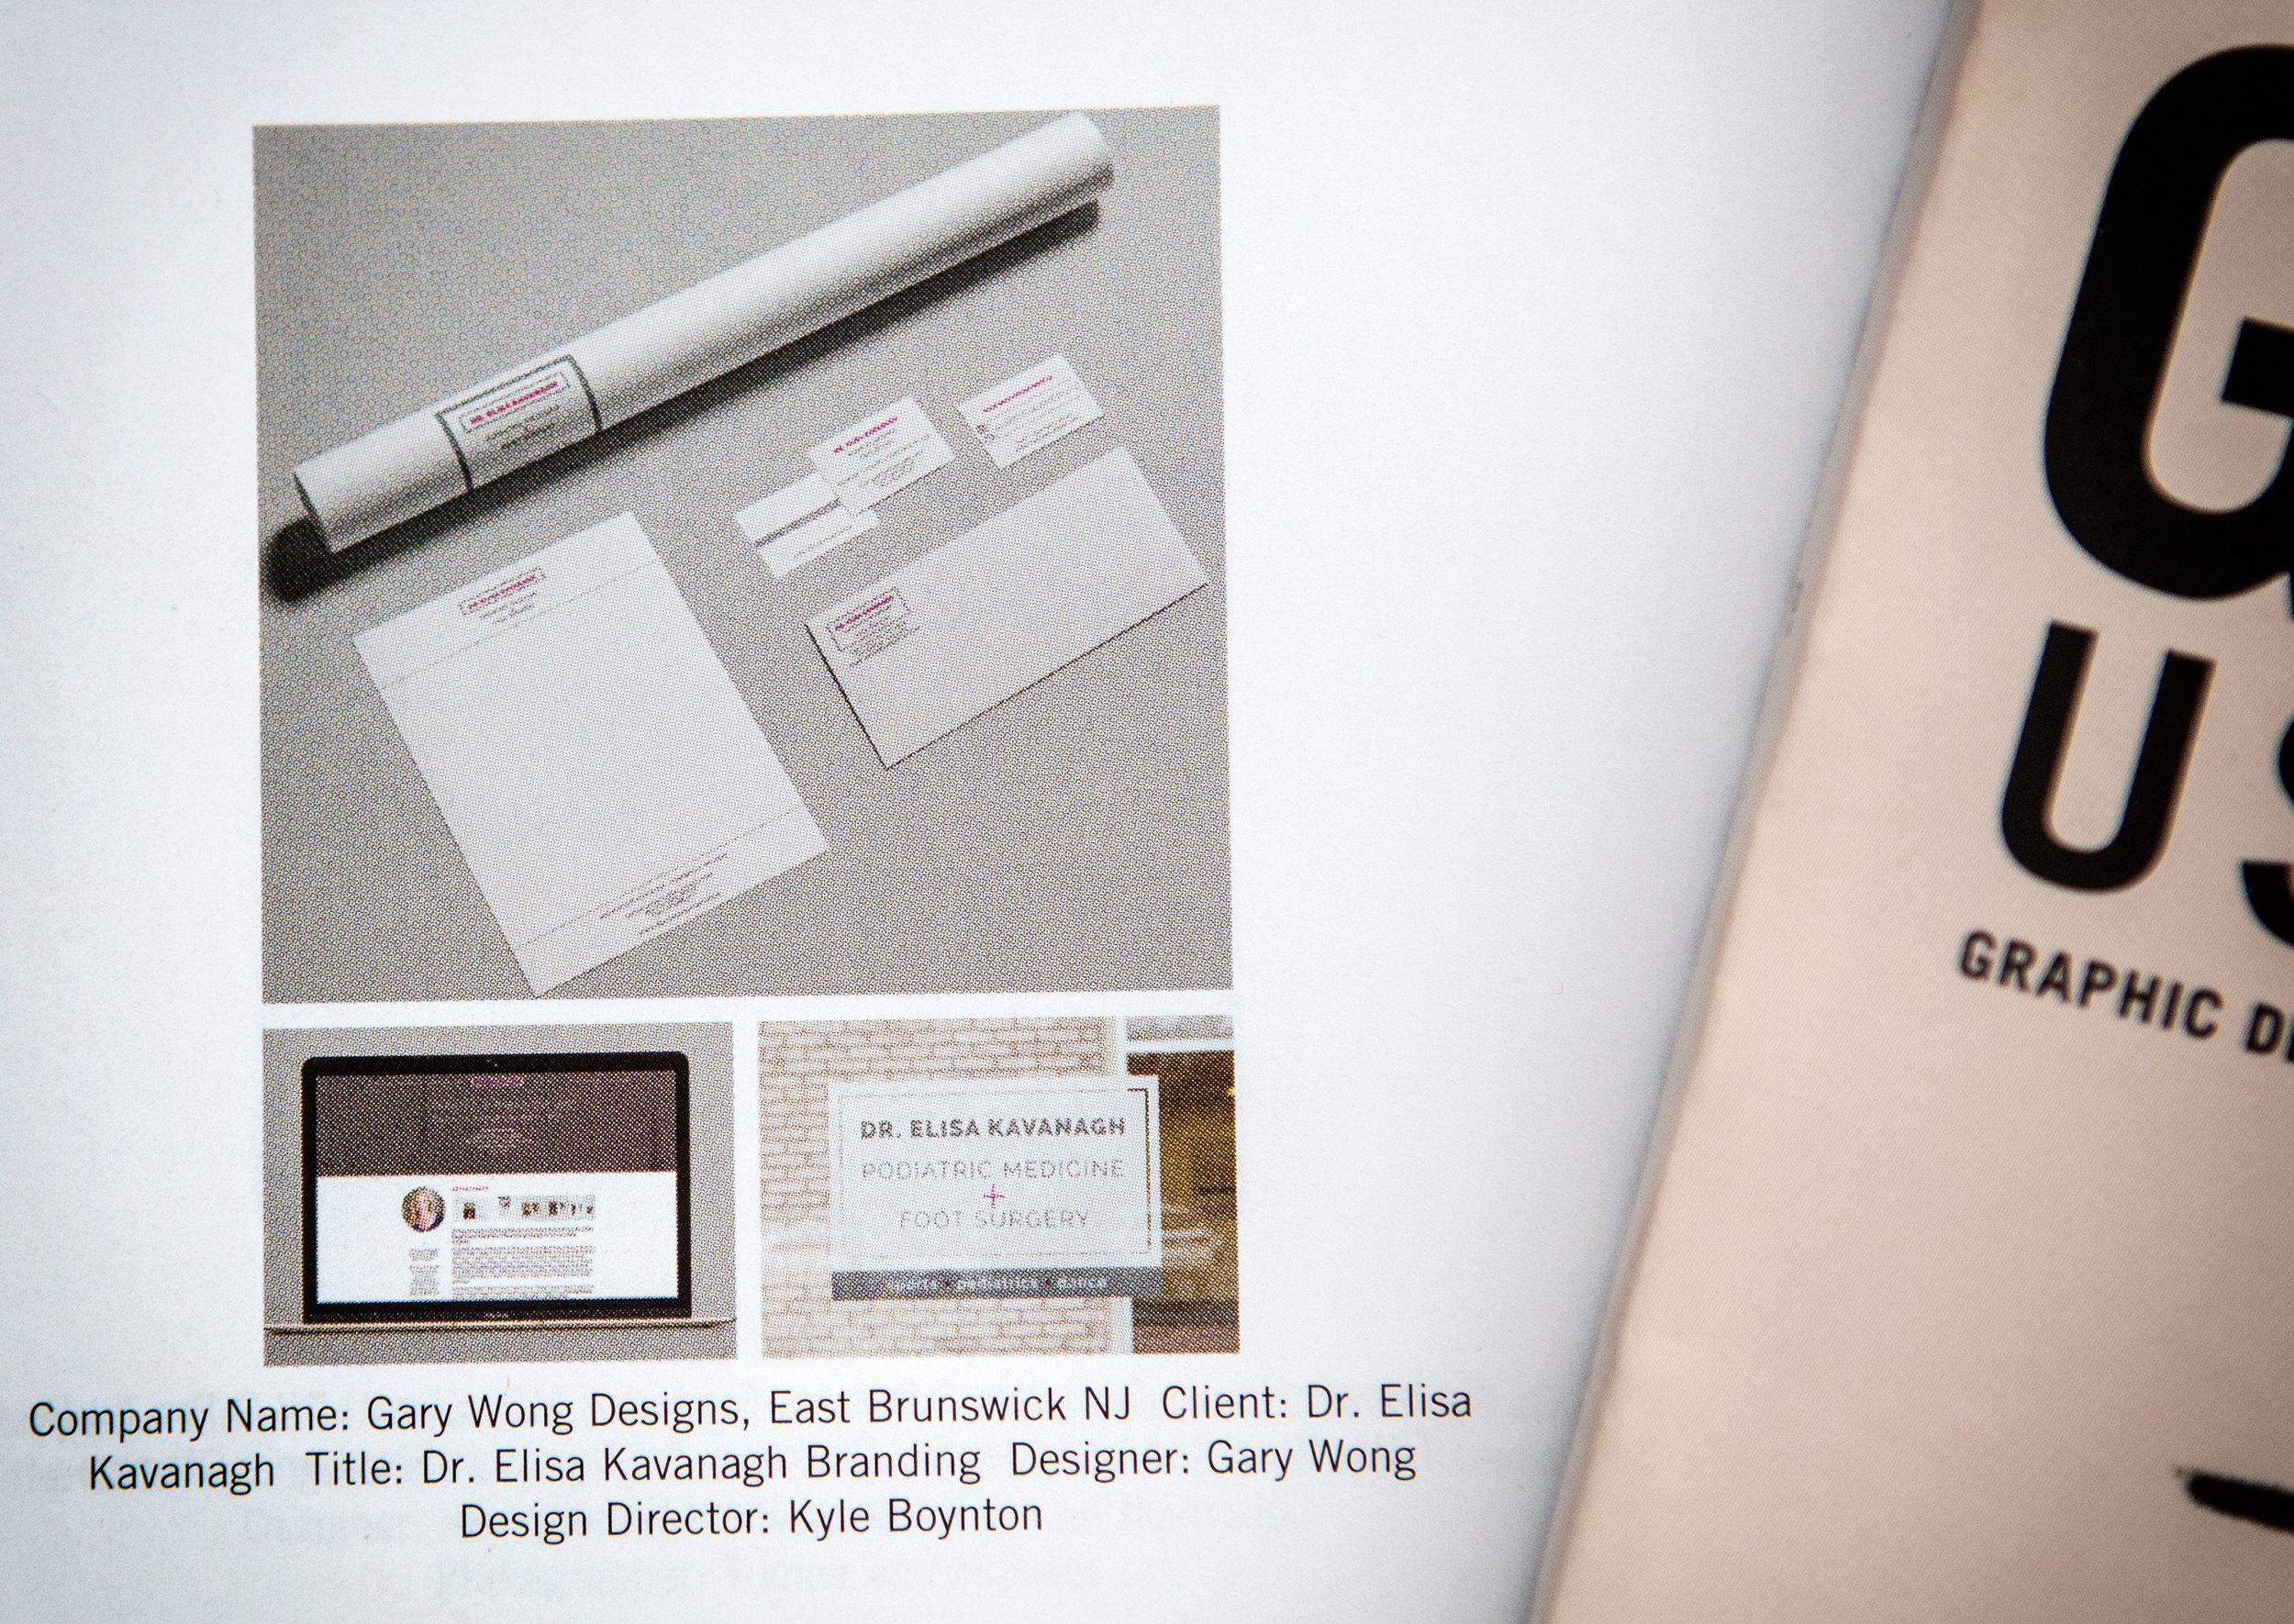 Category: Branding  Client: Dr. Elisa Kavanagh